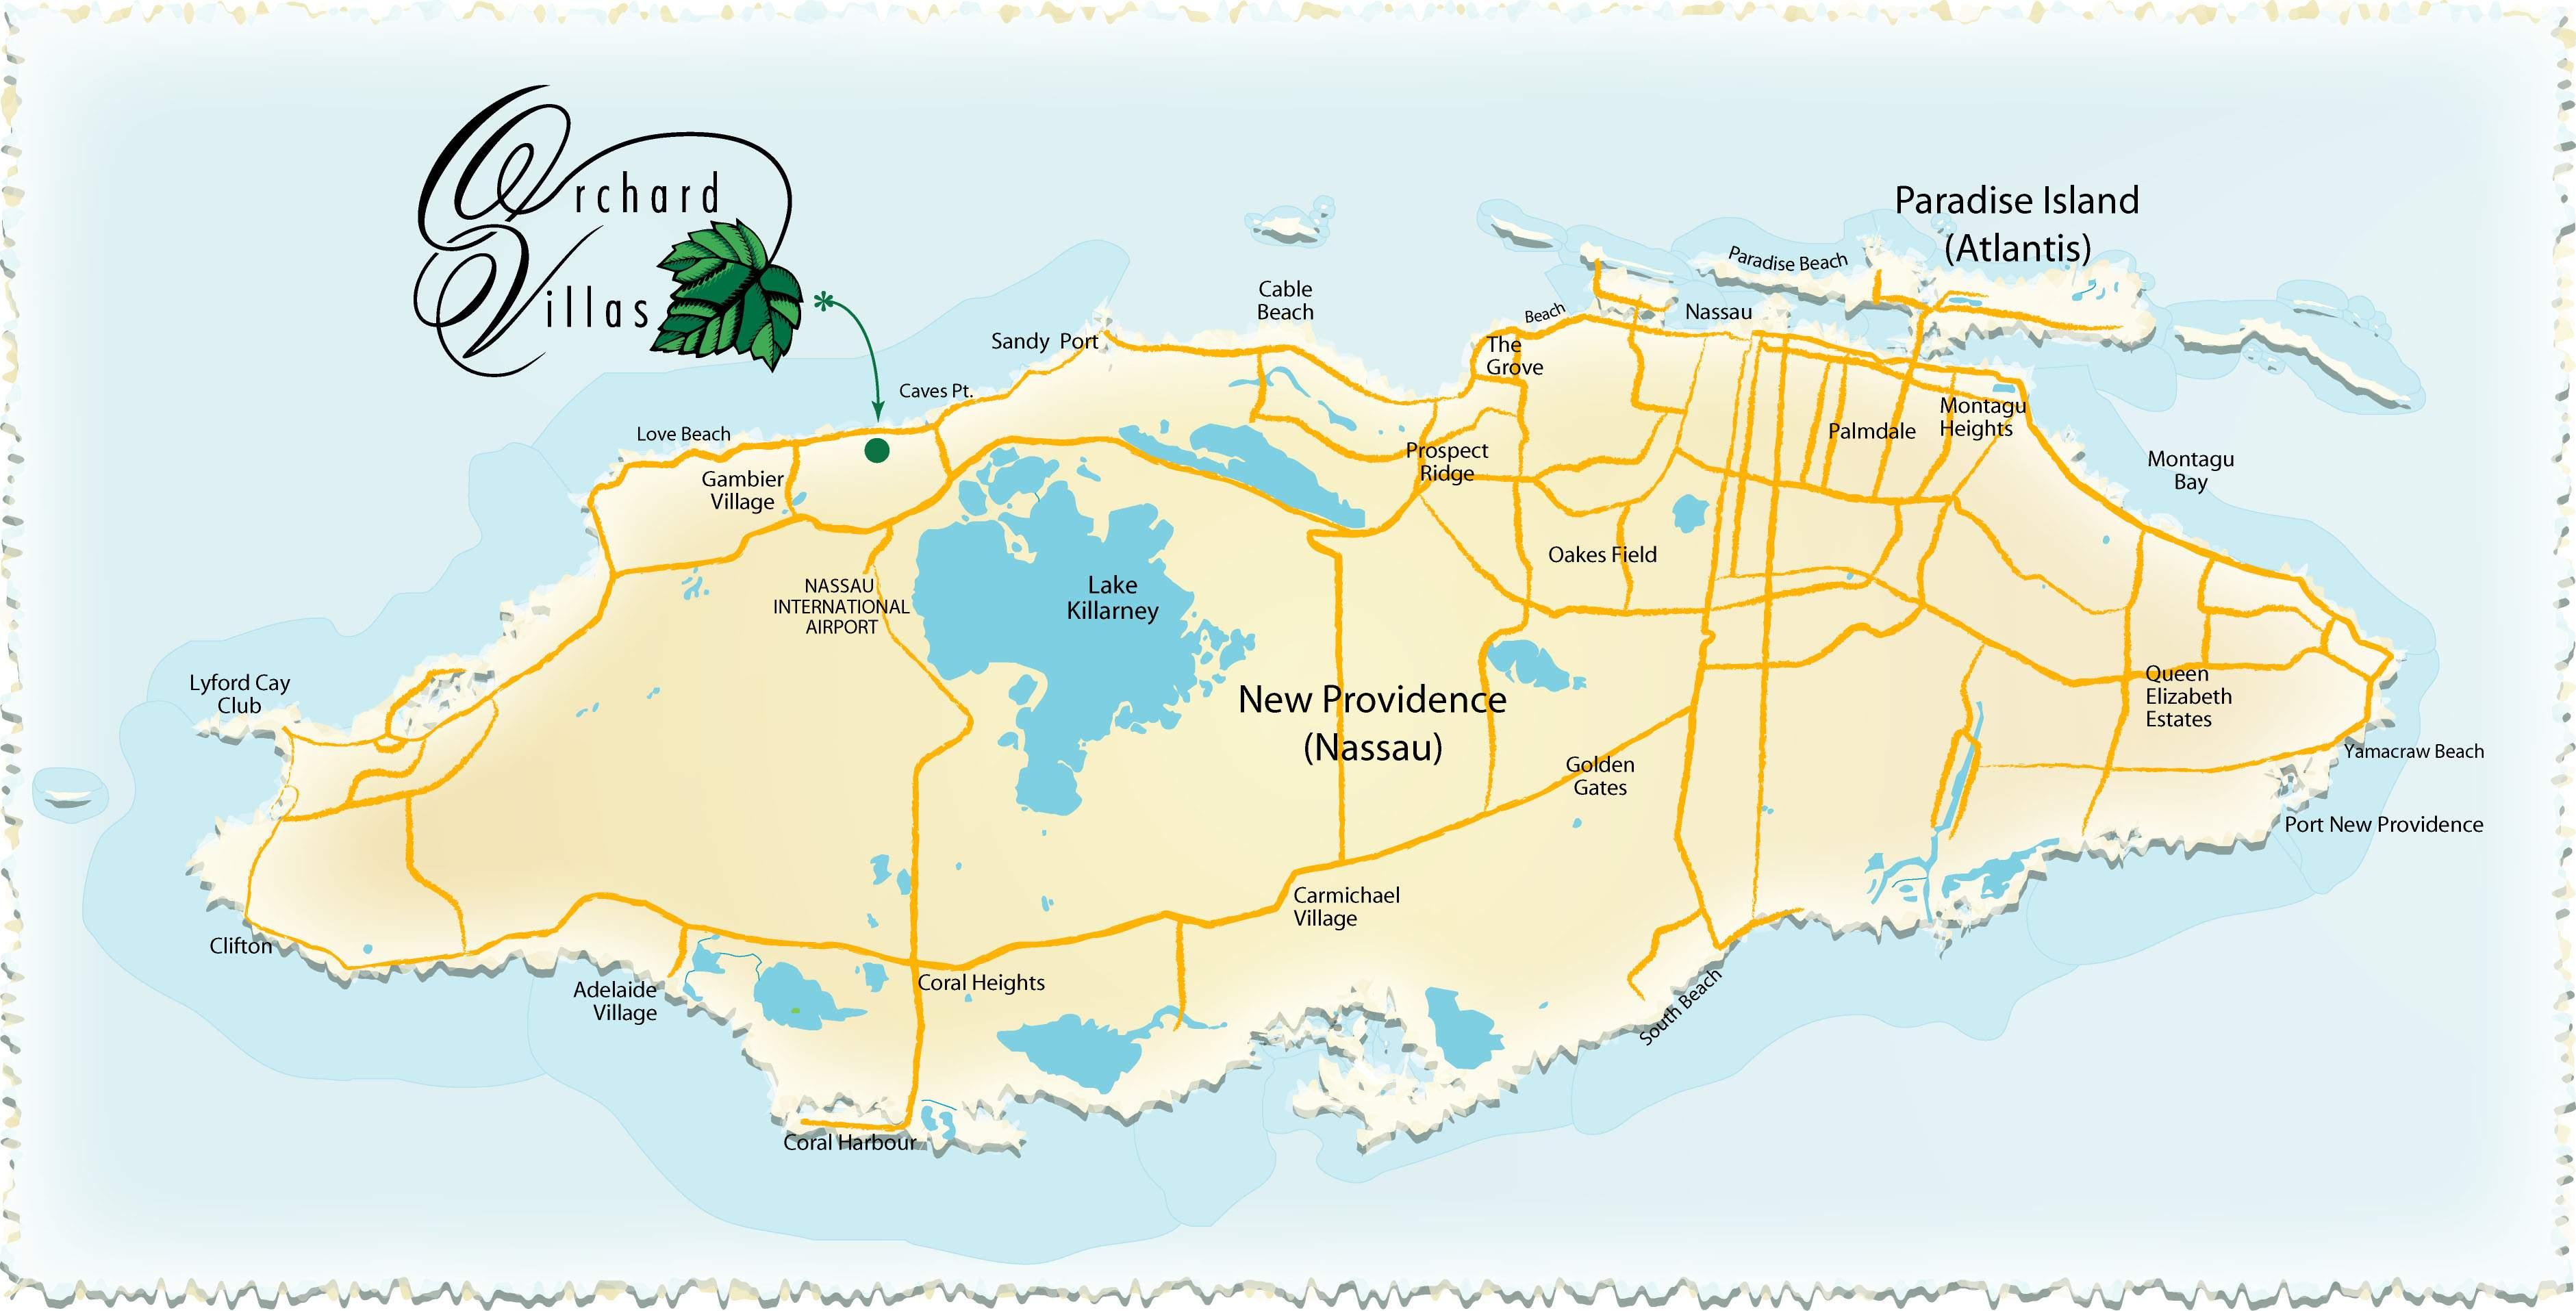 Large Nassau Maps For Free Download And Print   High-Resolution And - Printable Map Of Nassau Bahamas